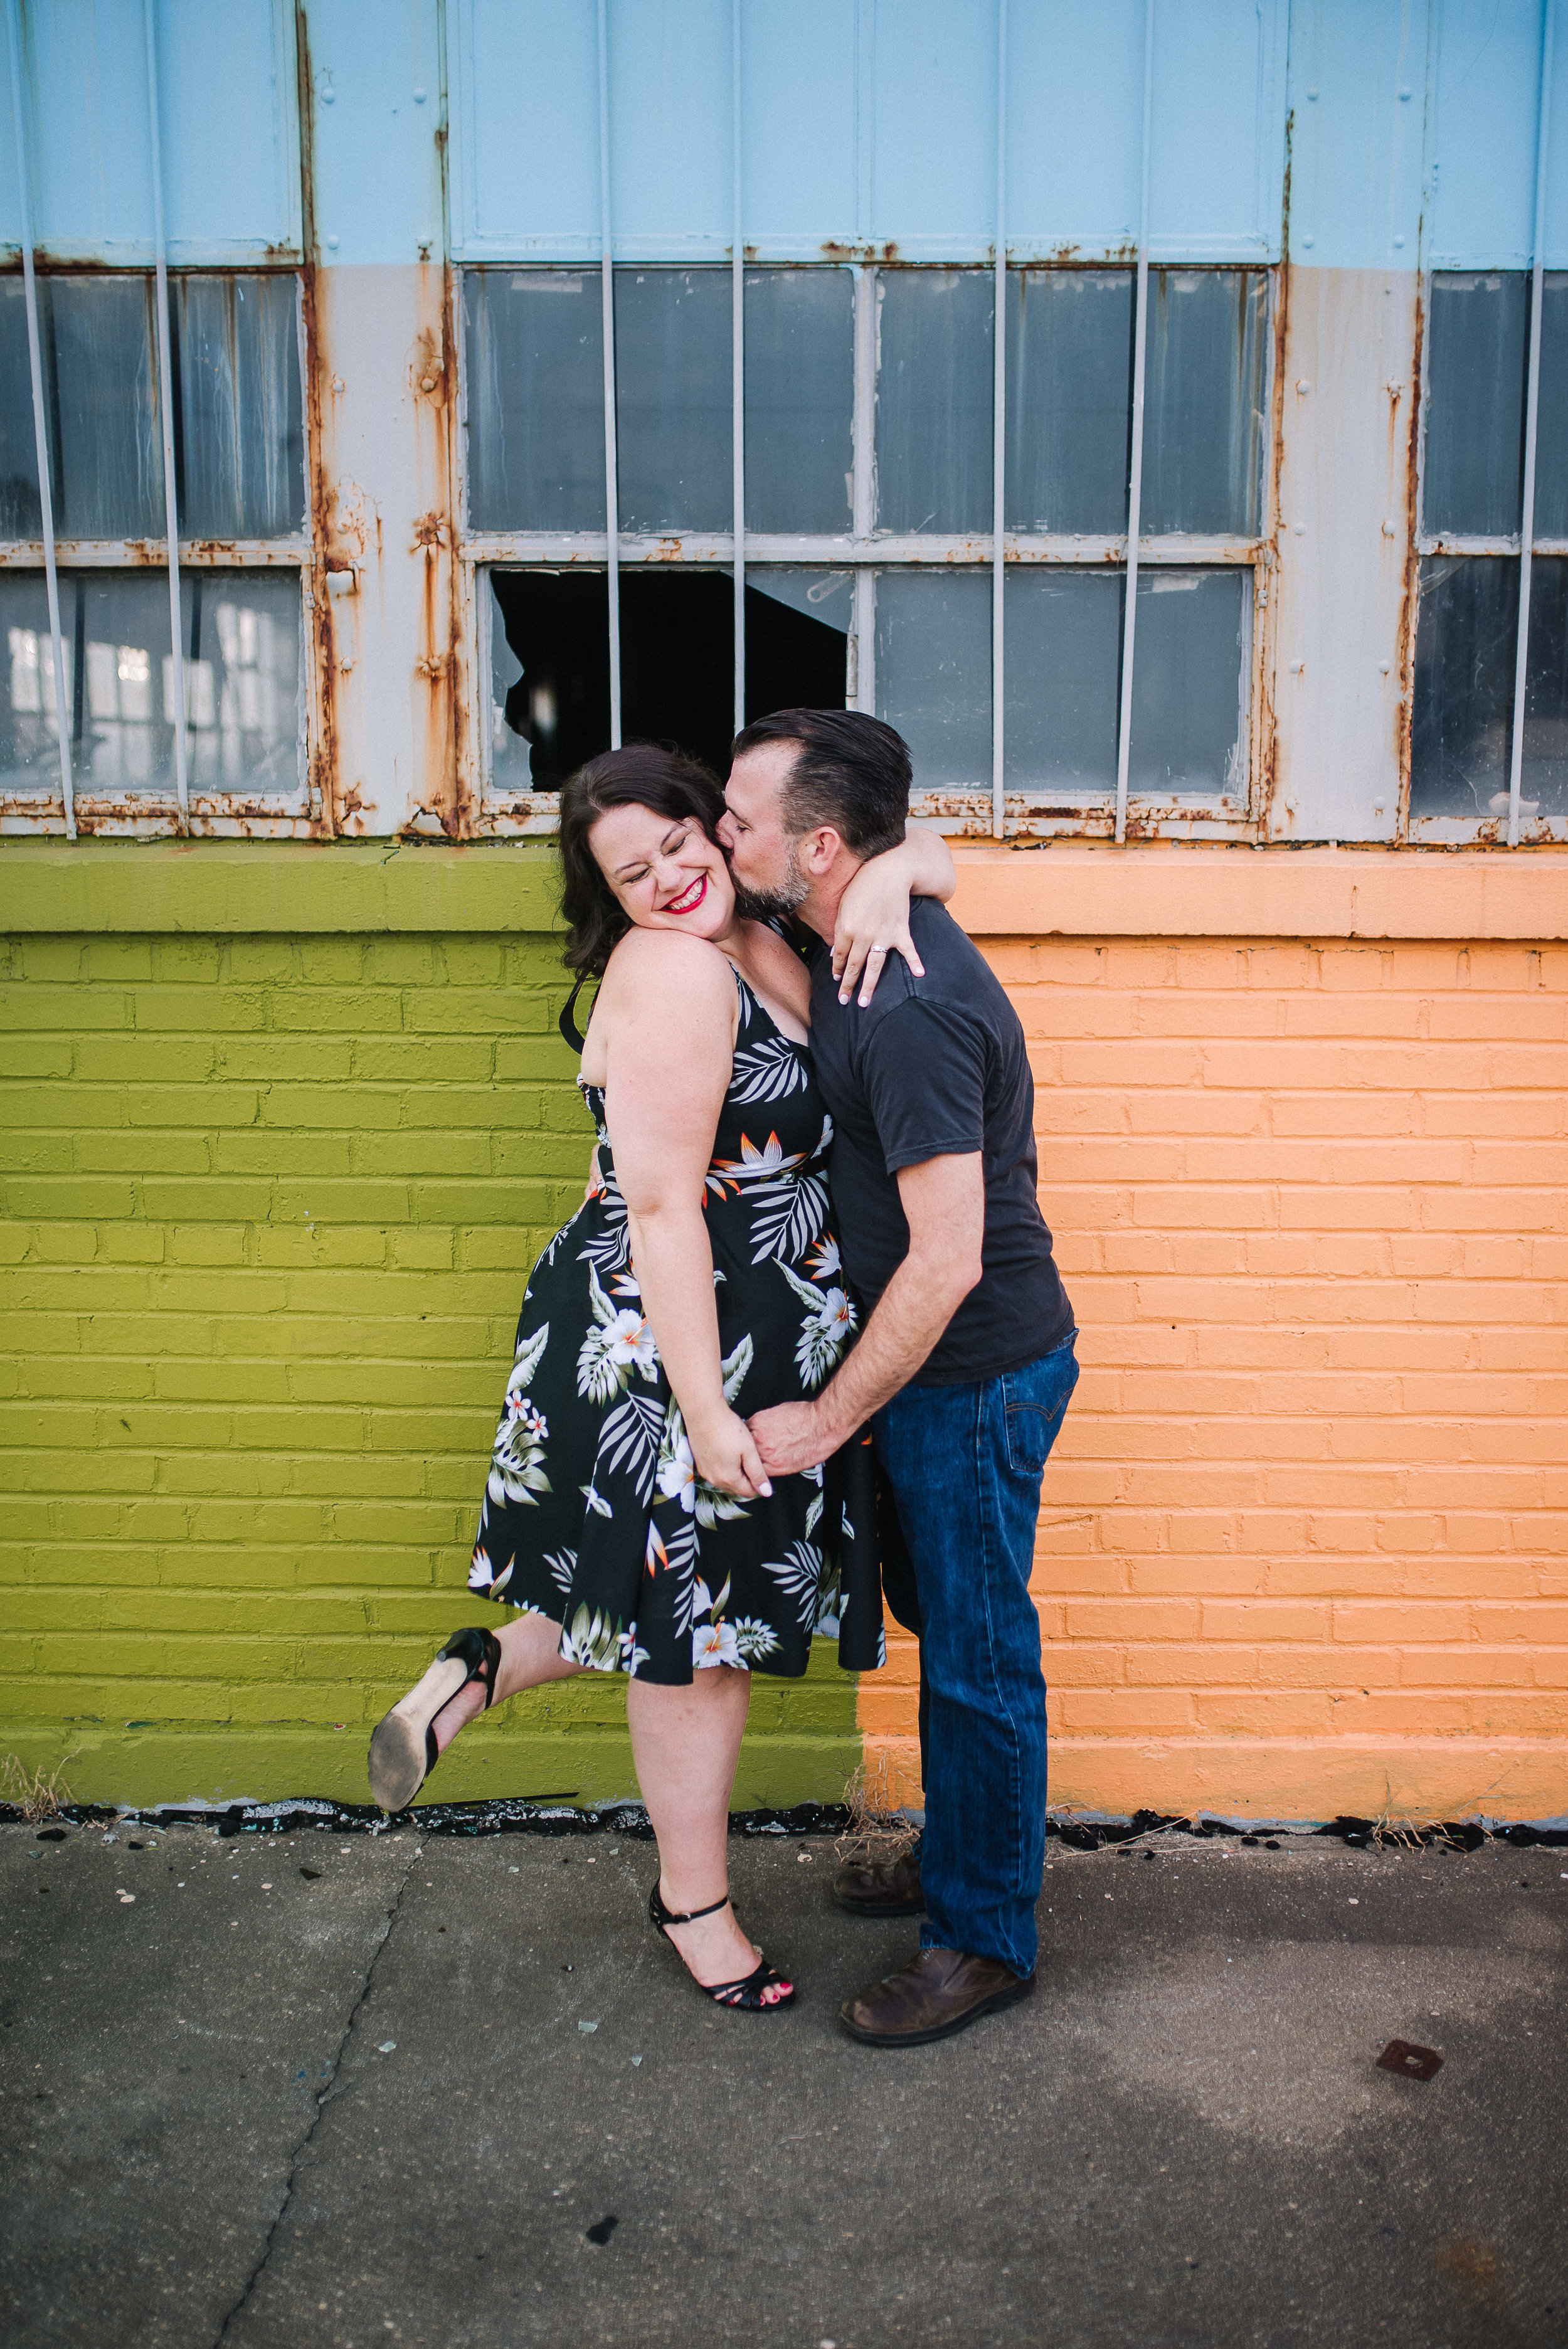 Megan & Steve_Broad Ave Engagement_Ashley Benham Photography-32.jpg